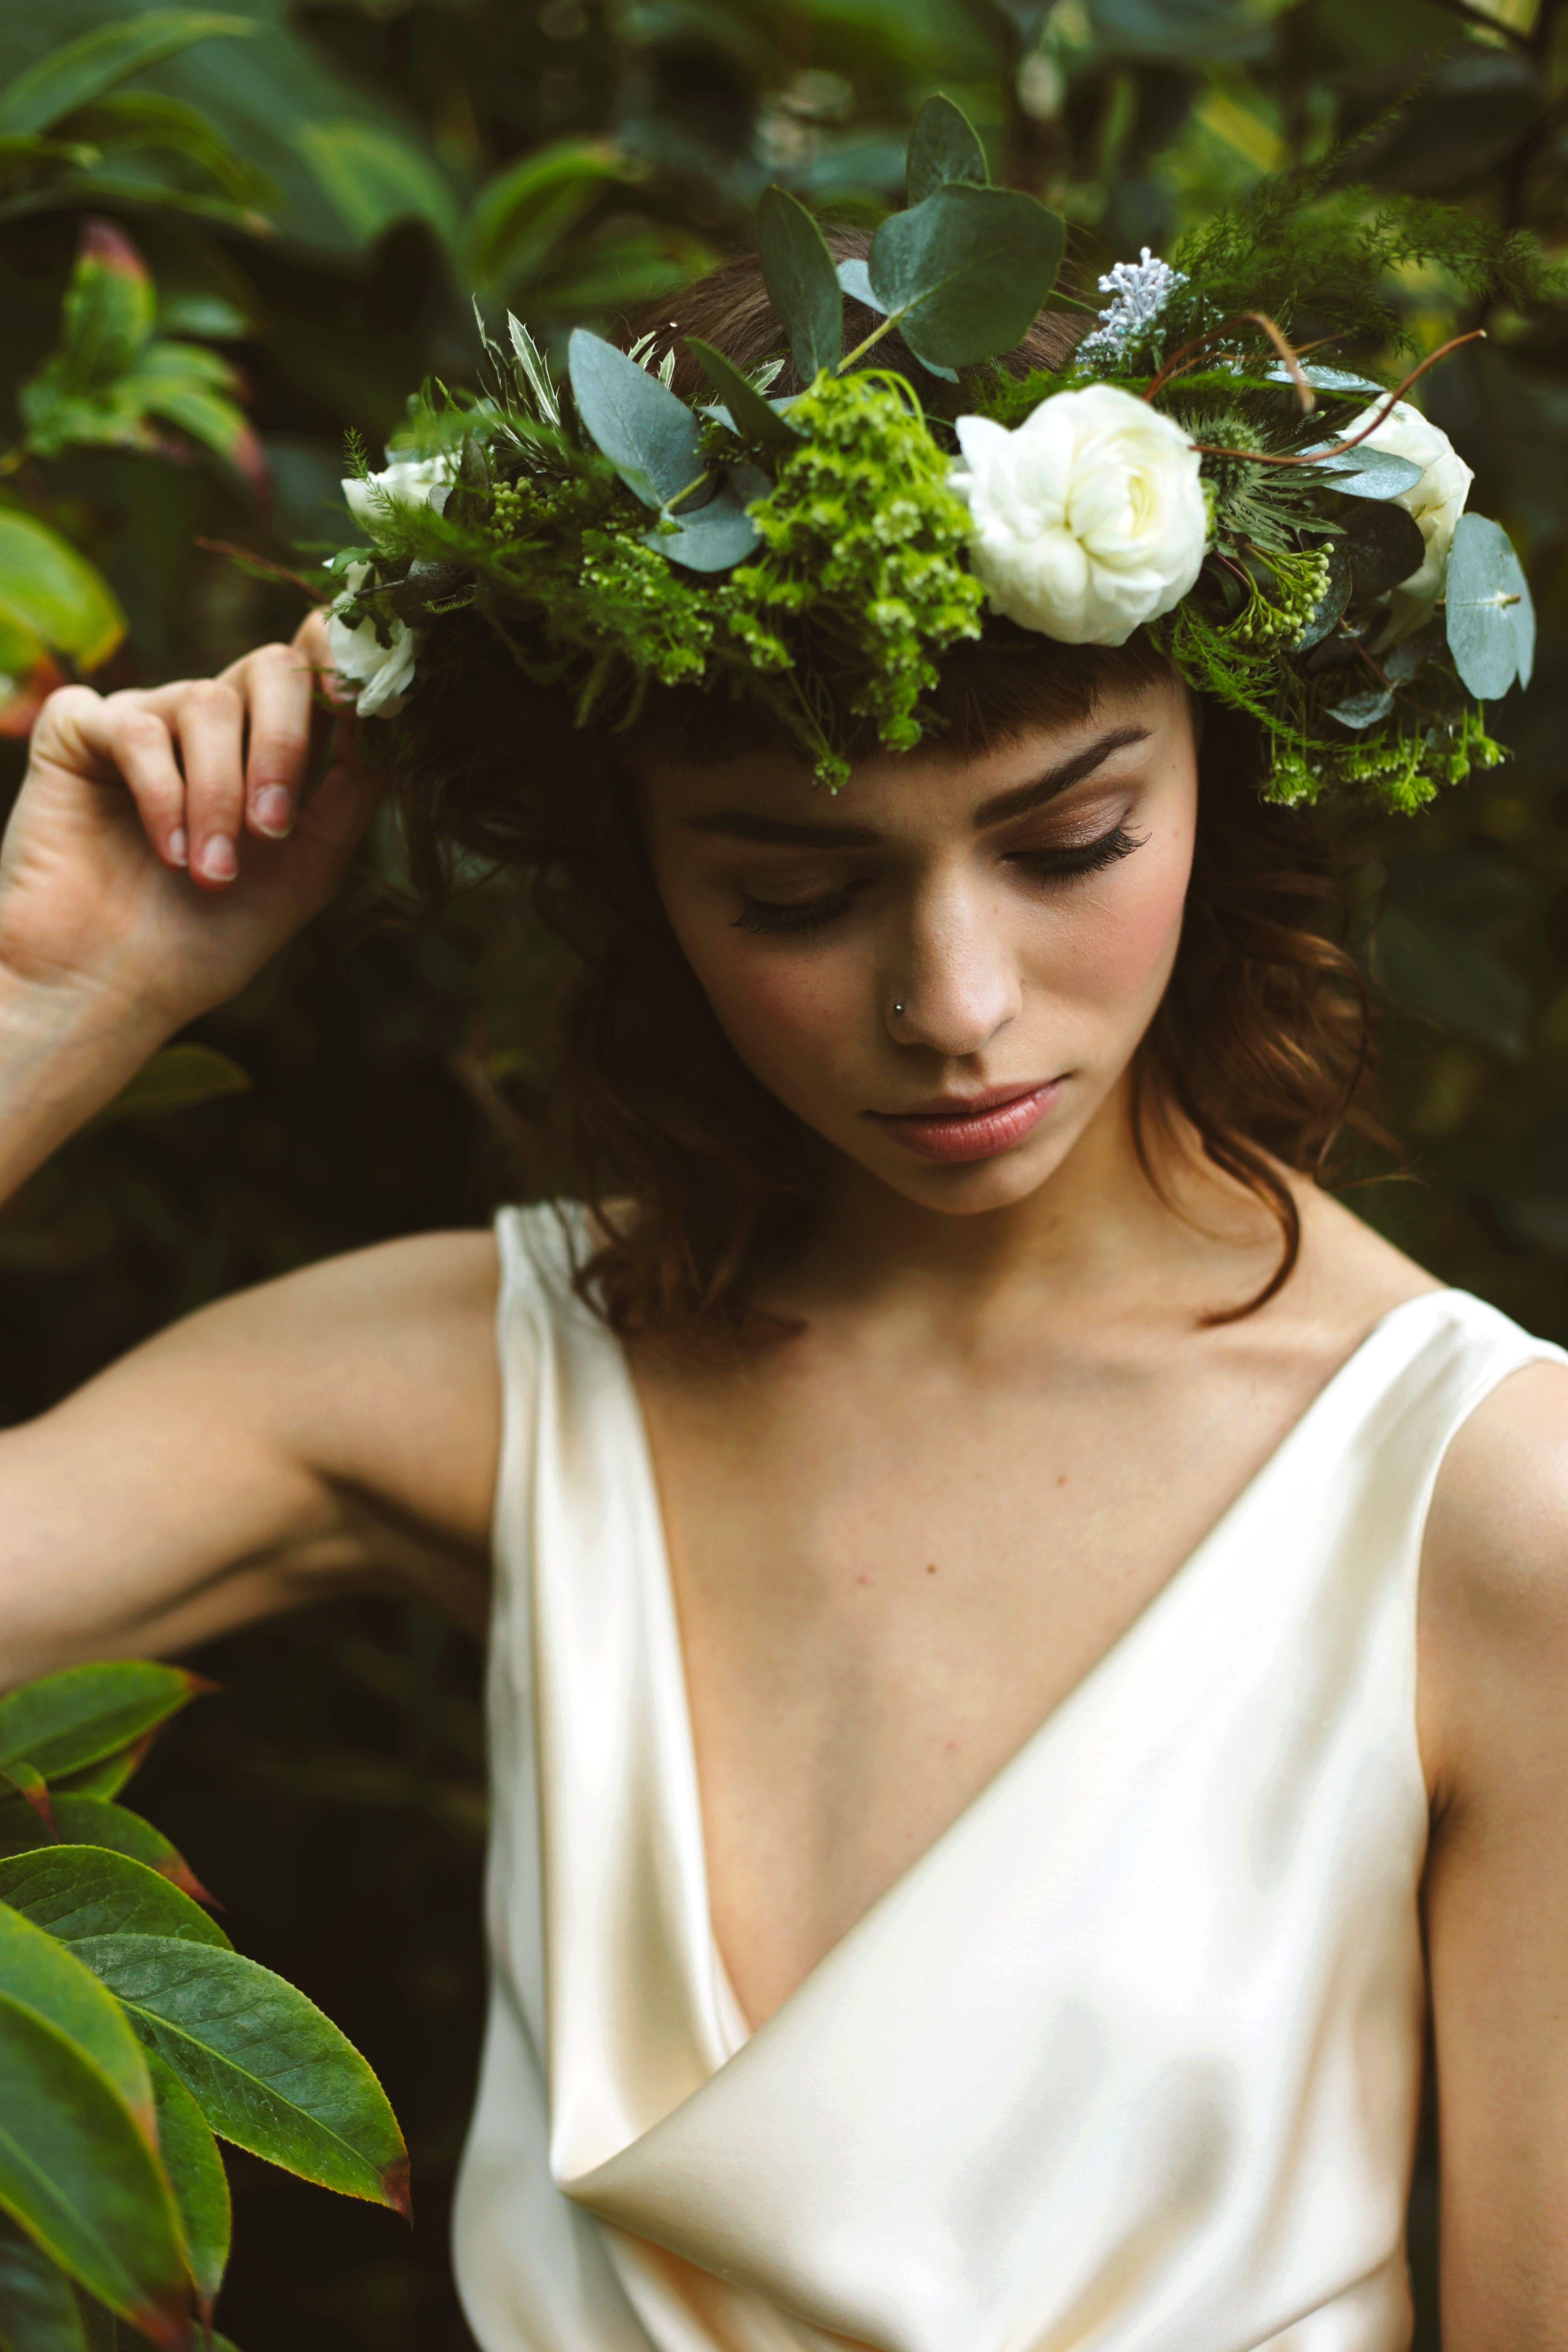 Model Katie Altoft Hair Gypsy Rose Beauty Make Up